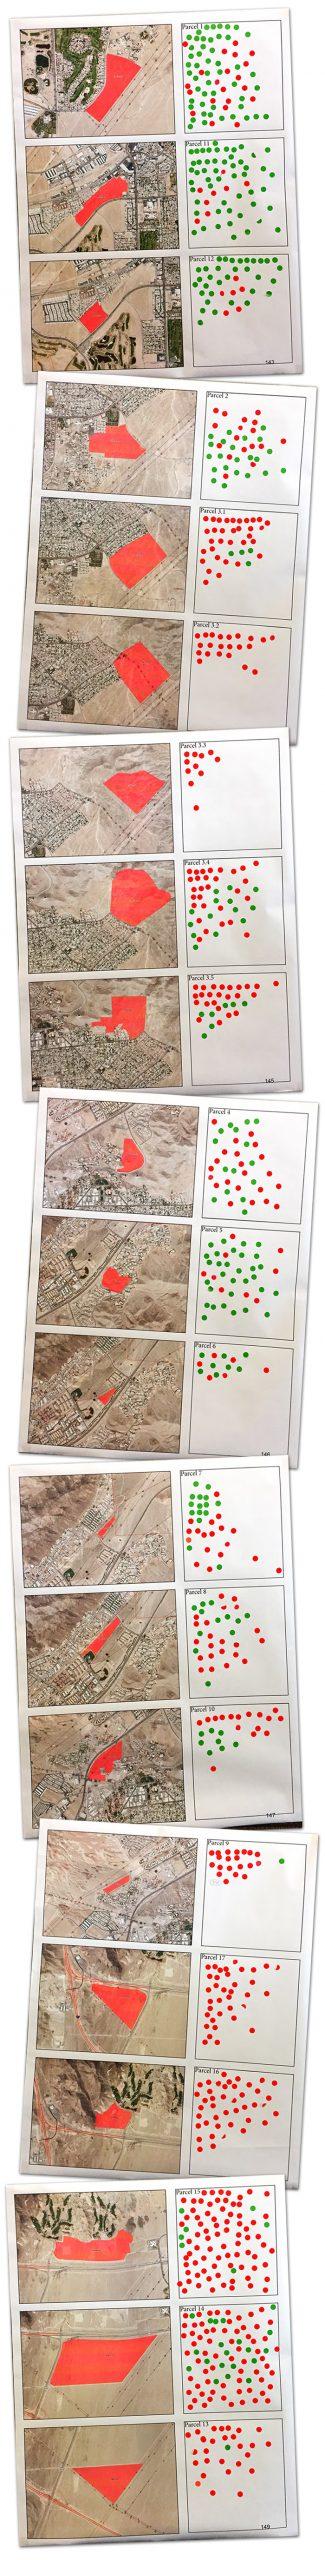 Red Dot Green Dot Maps on Land Management Plan in Boulder City, Nevada